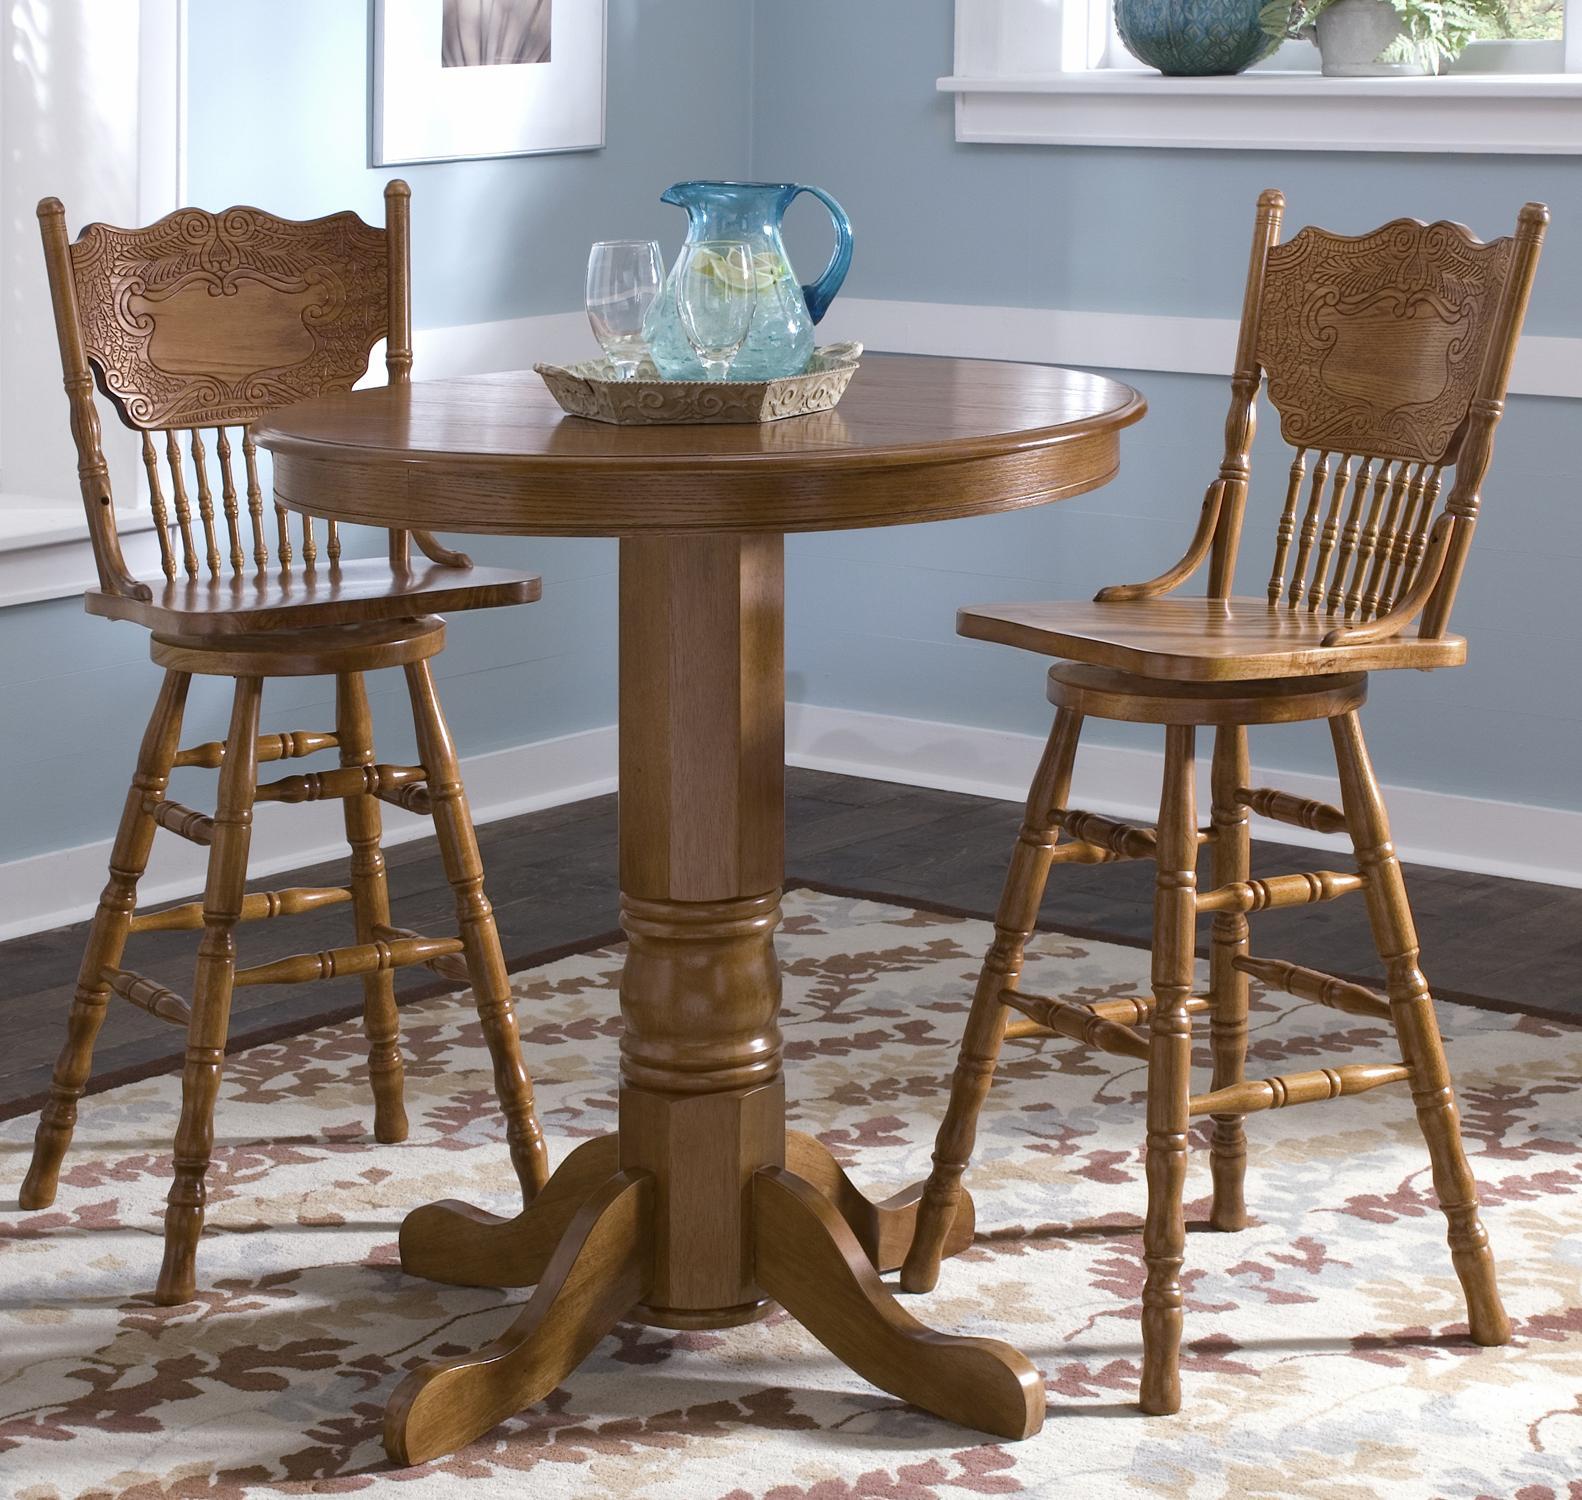 Superieur Liberty Furniture Nostalgia 3 Piece Round Pub Table Dining Set